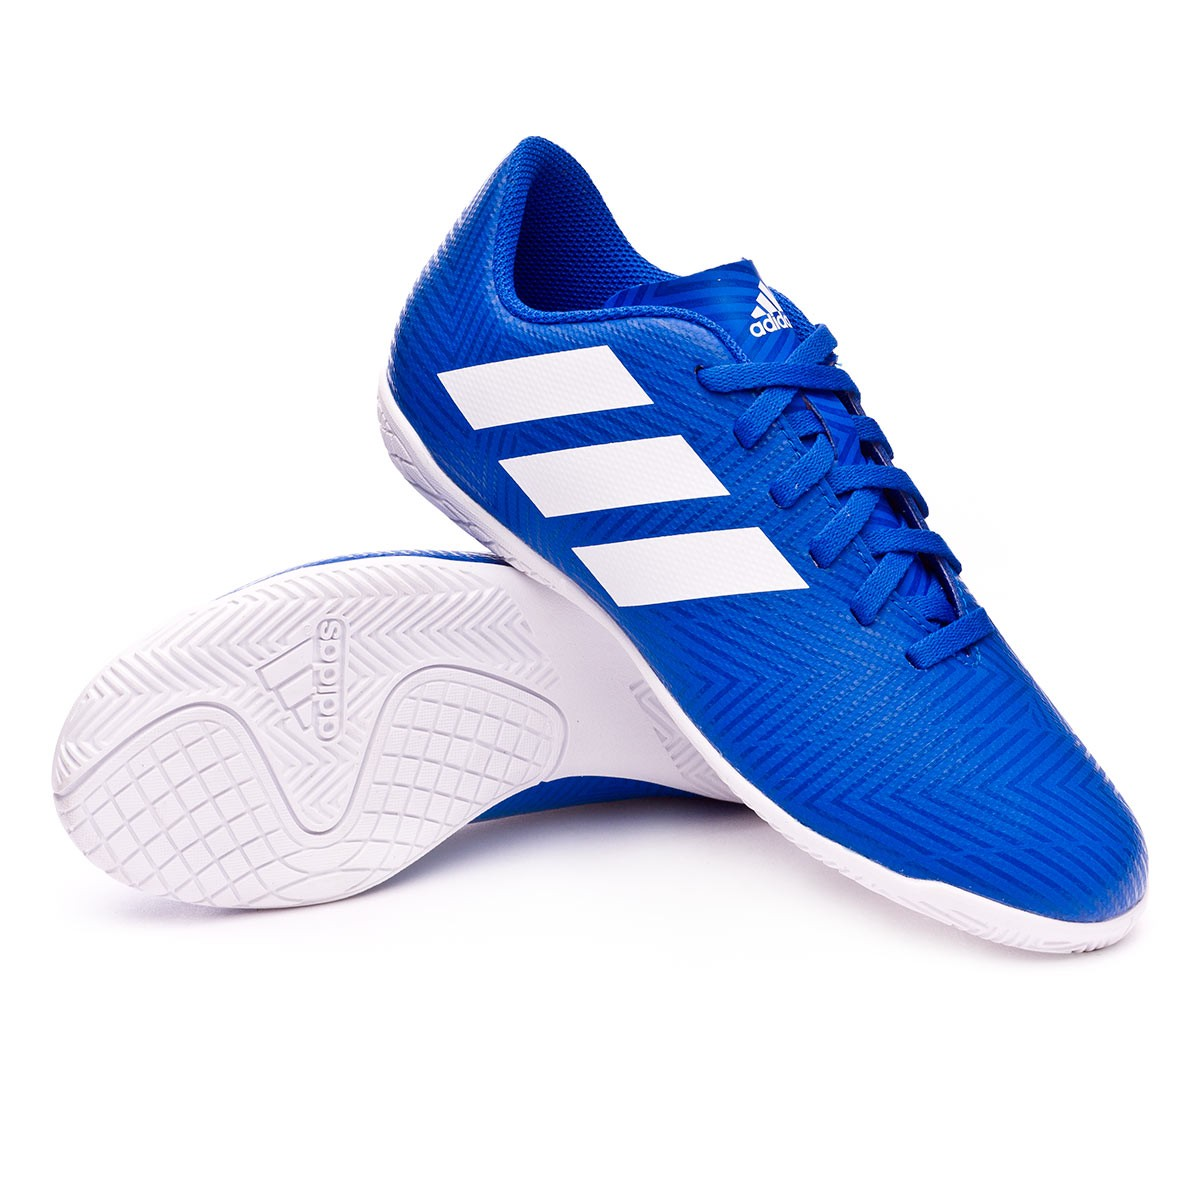 c672c0a983525 Futsal Boot adidas Kids Nemeziz Tango 18.4 IN Football blue-White ...